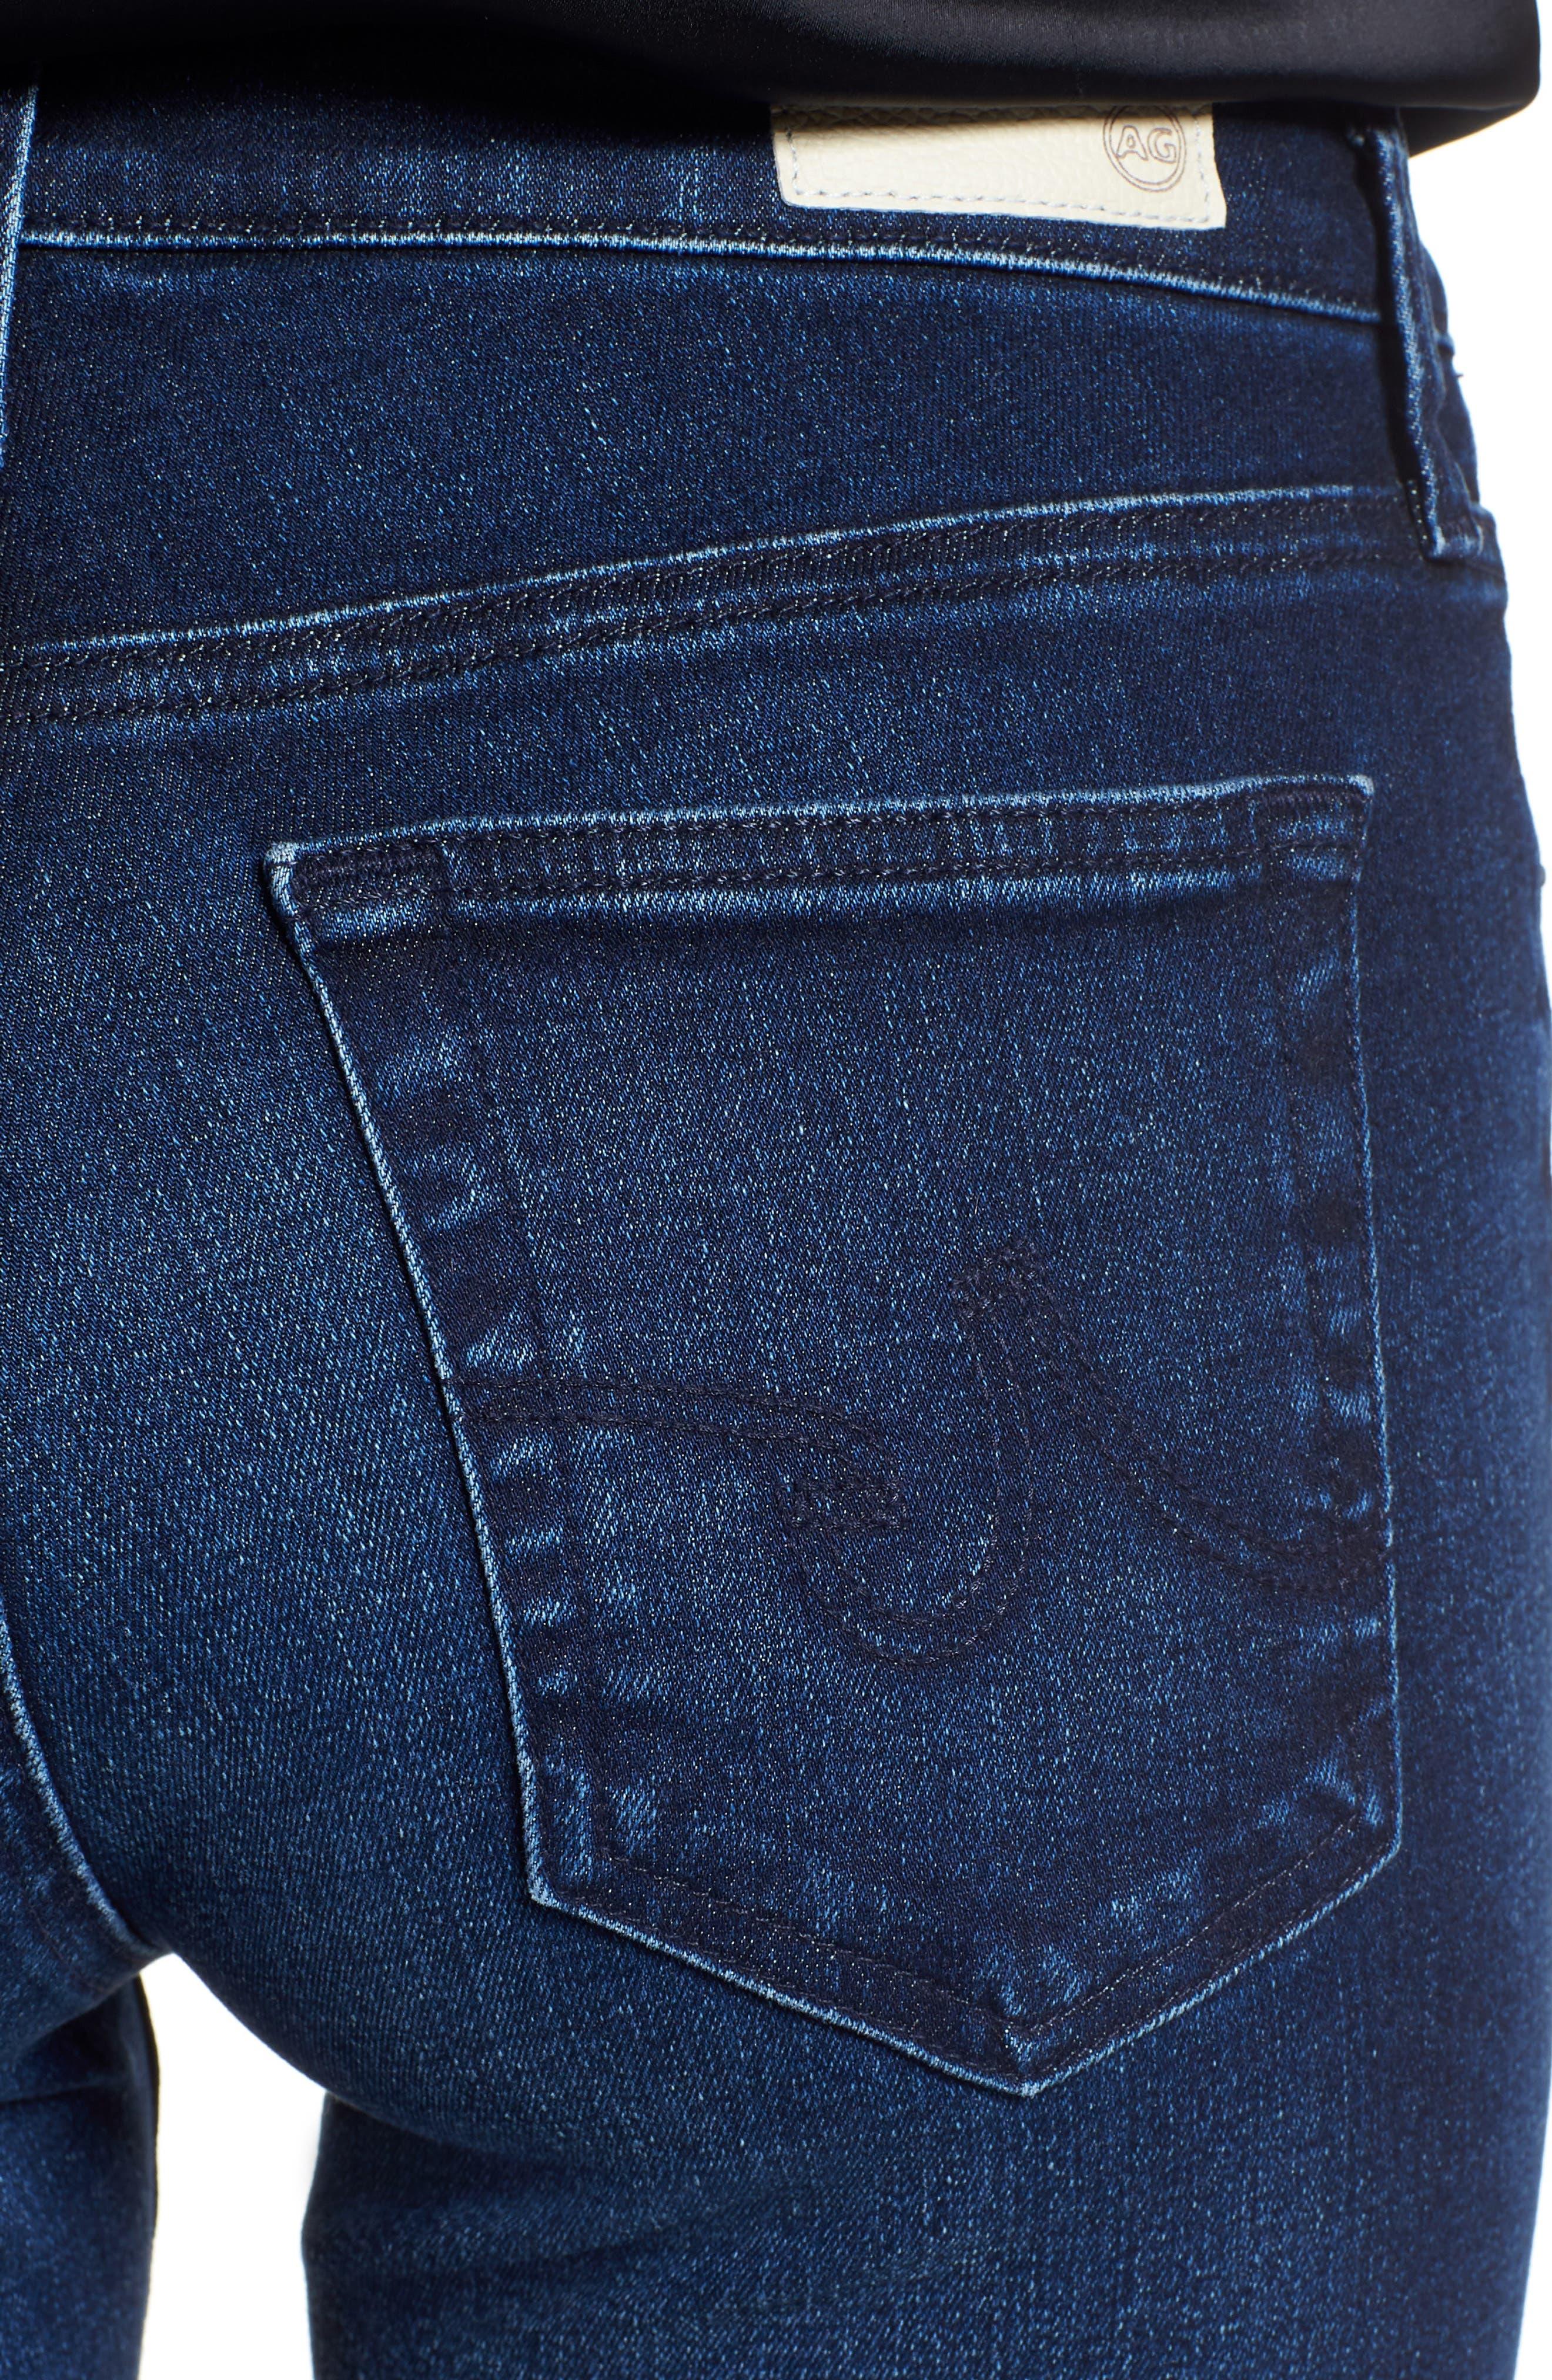 Prima Skinny Jeans,                             Alternate thumbnail 4, color,                             04 Years Celestial